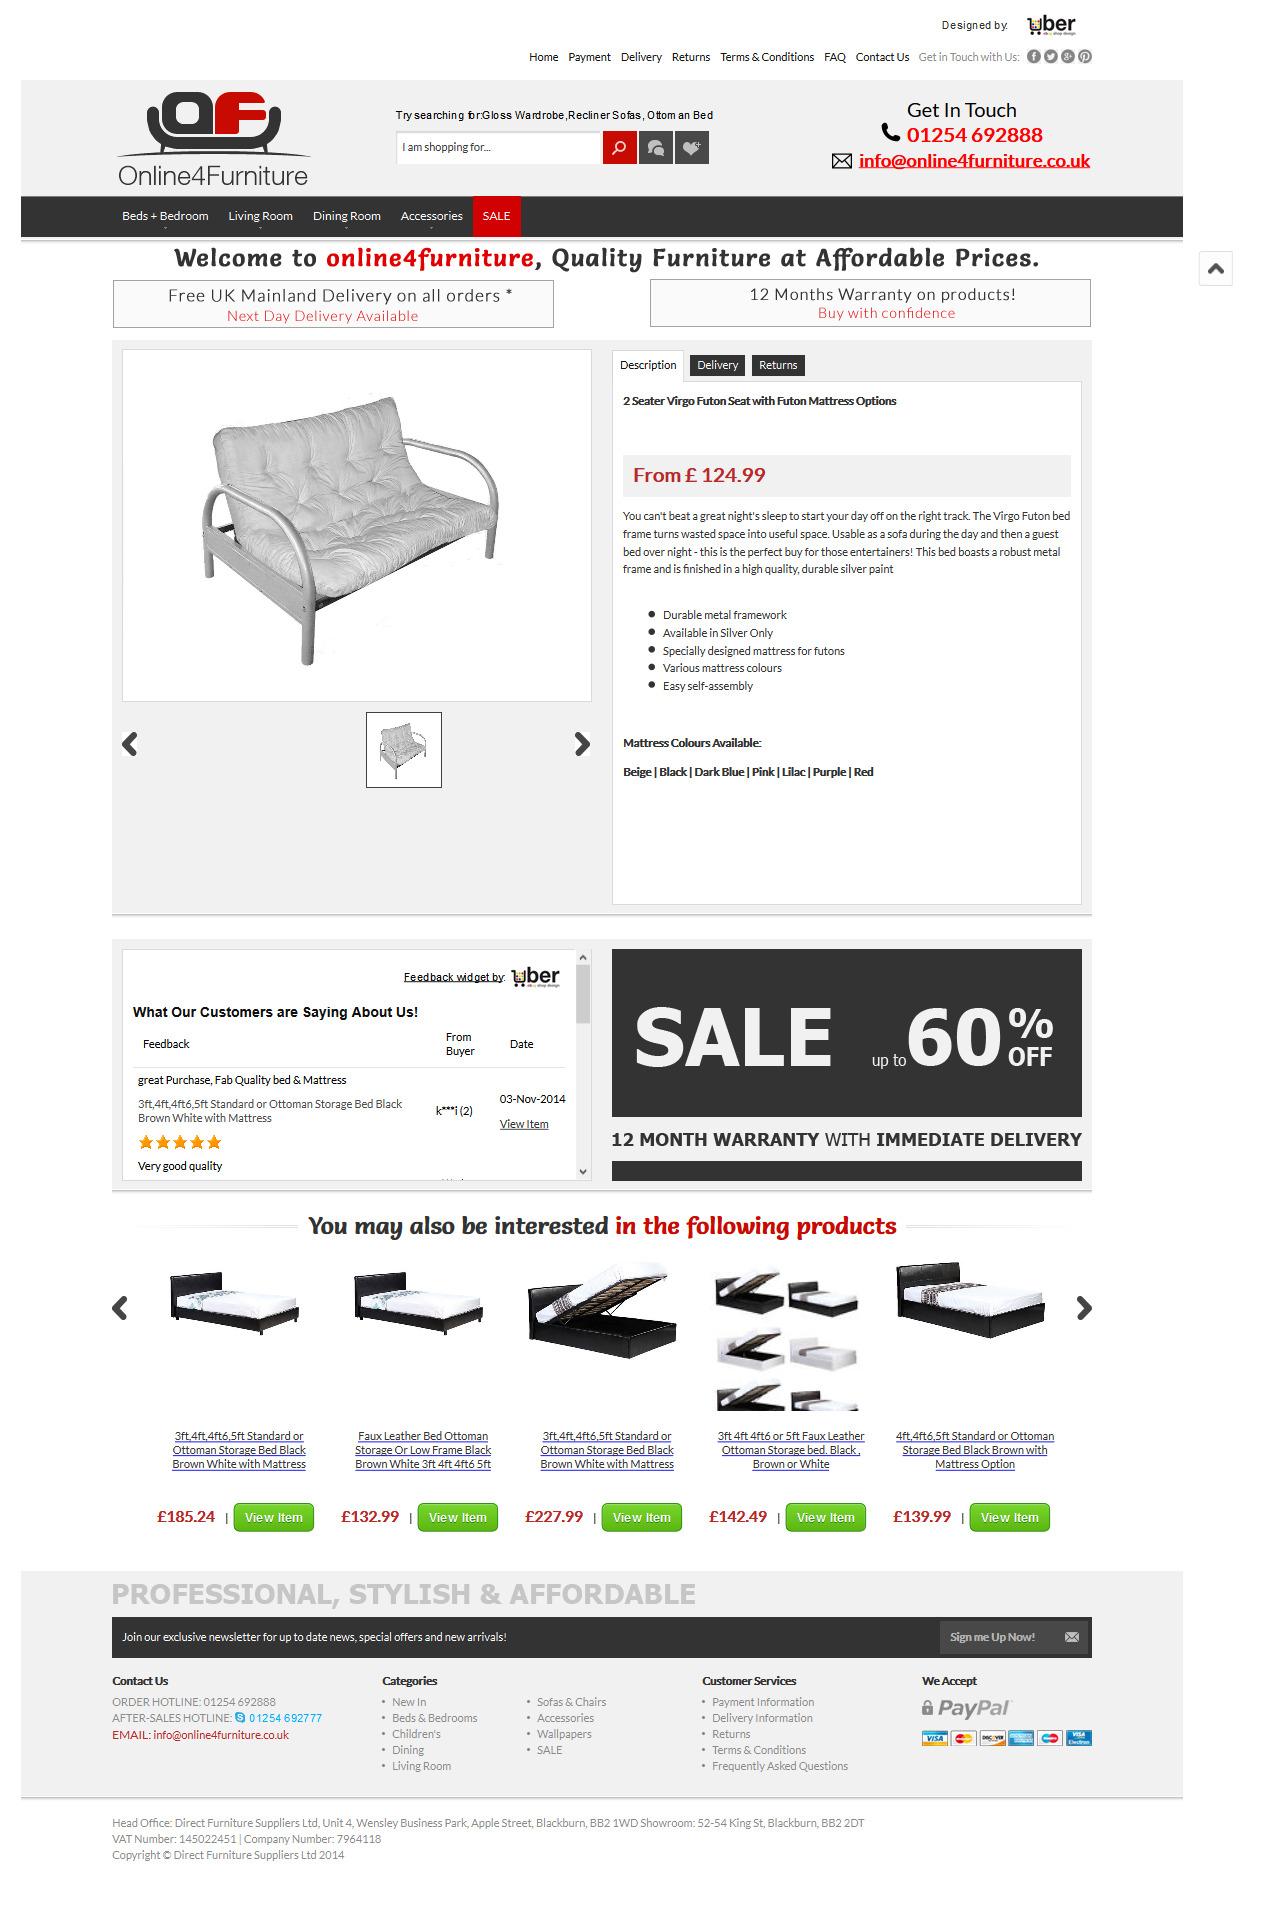 Online4Furniture ebay item template design